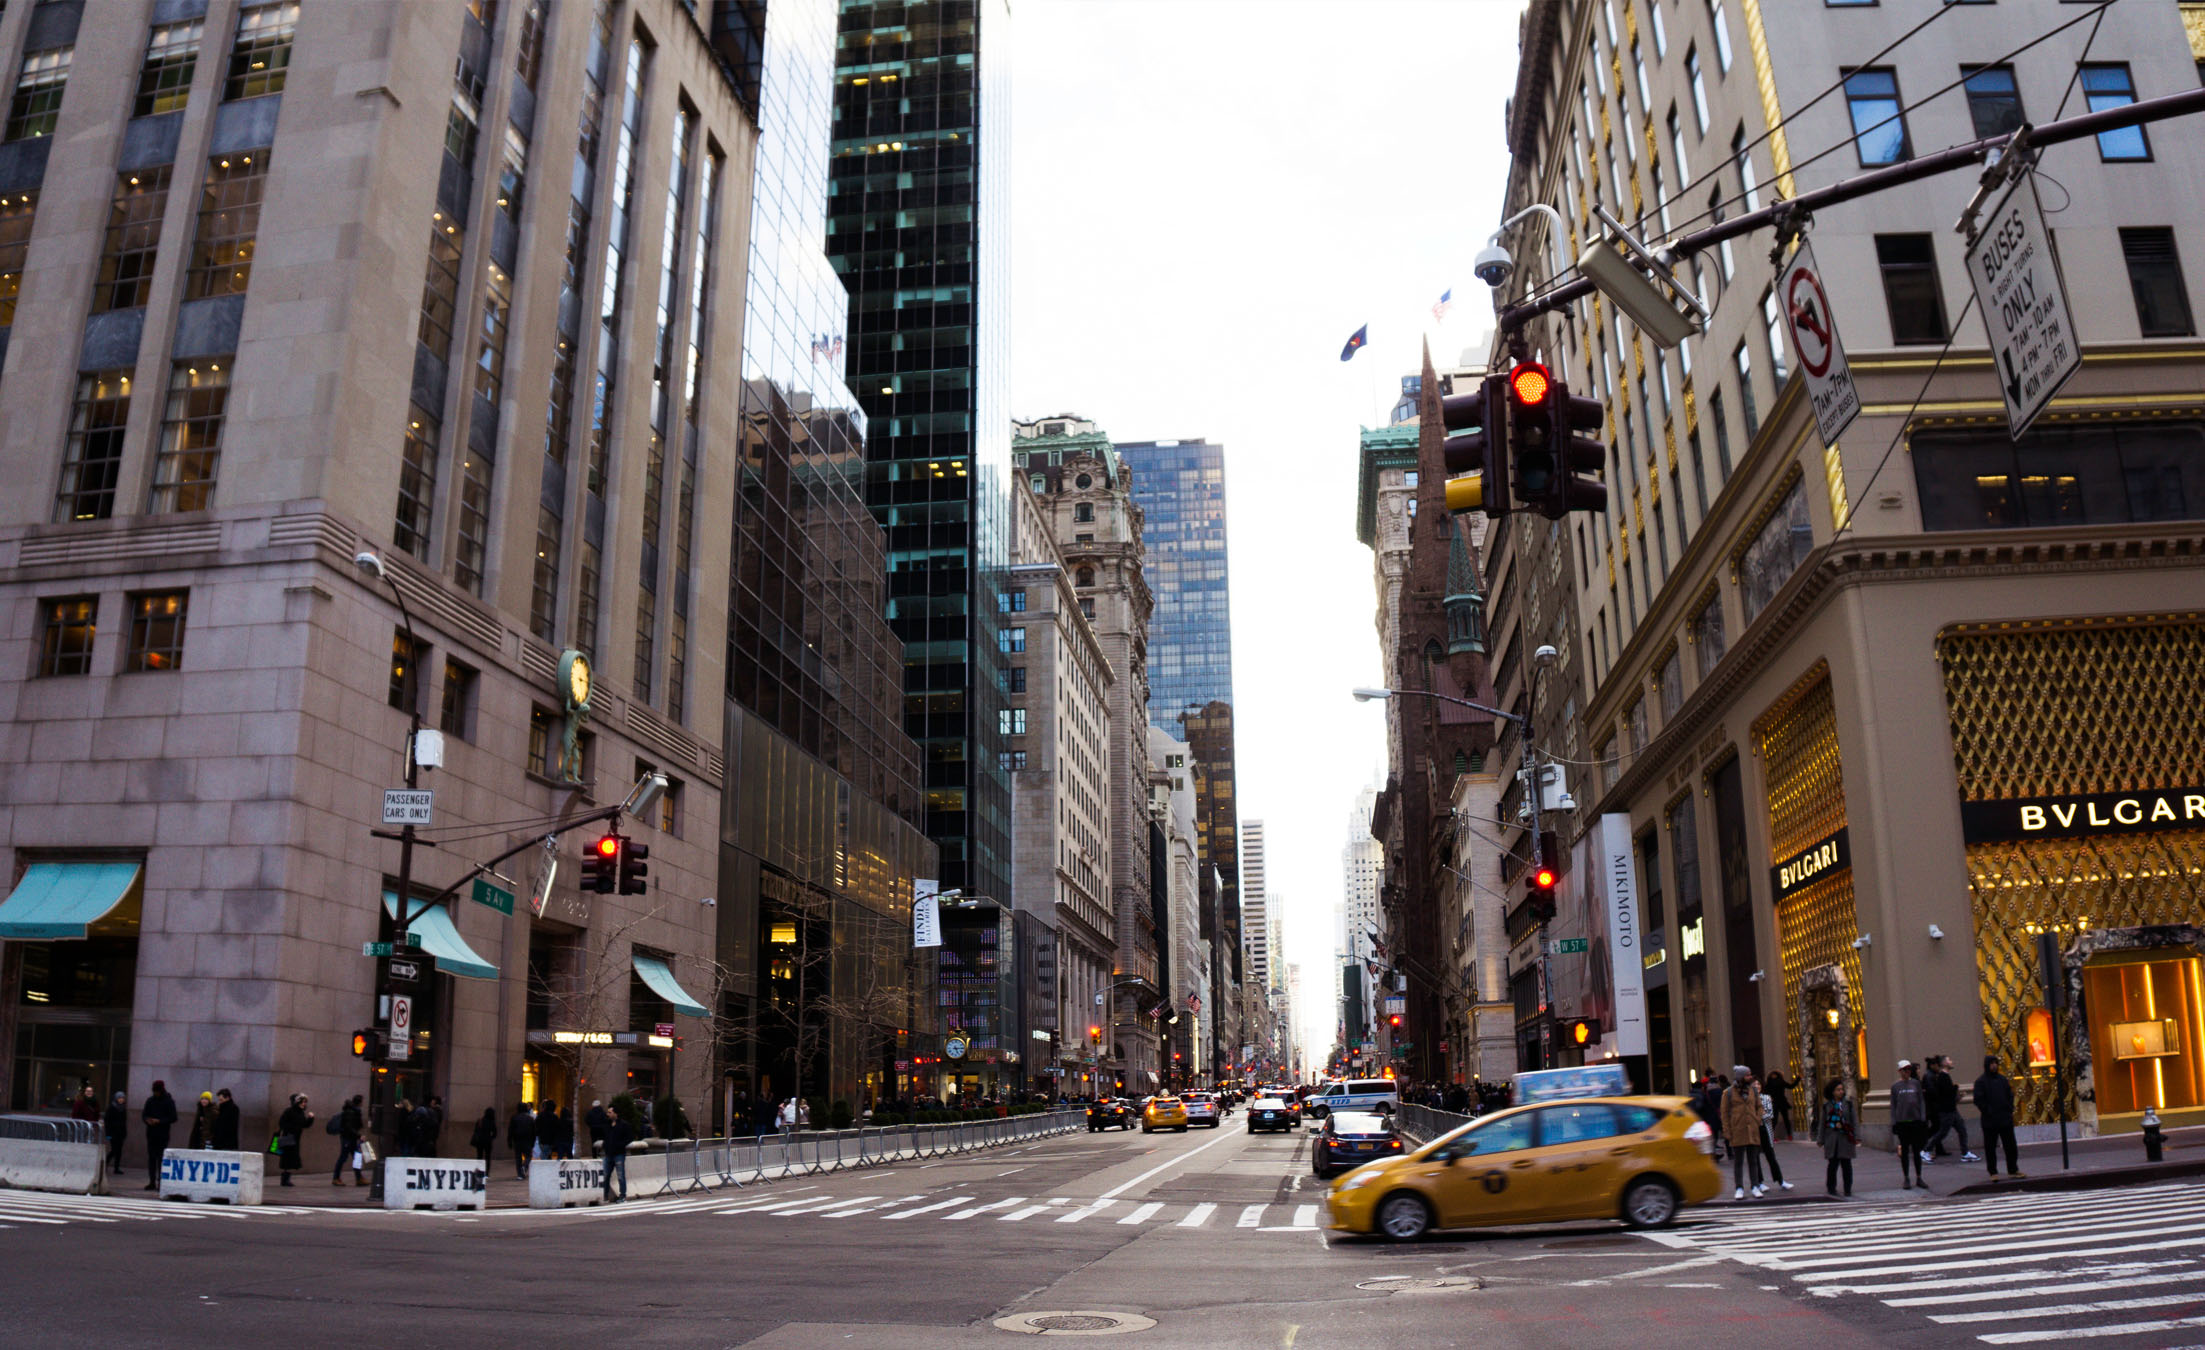 newyork st day2.jpg